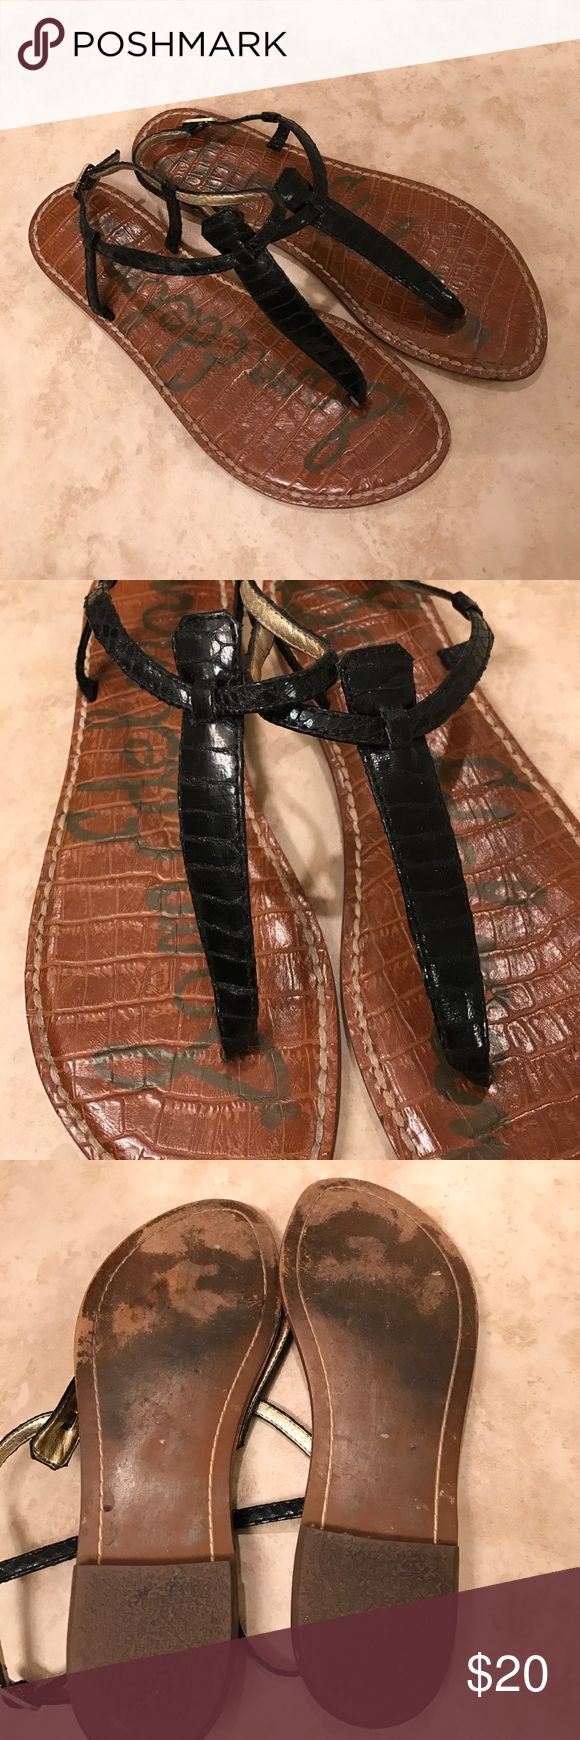 Sam Edelman Gigi sandals Sam Edelman Gigi sandals. I'm normally an 8 and these fit fine. Sam Edelman Shoes Sandals